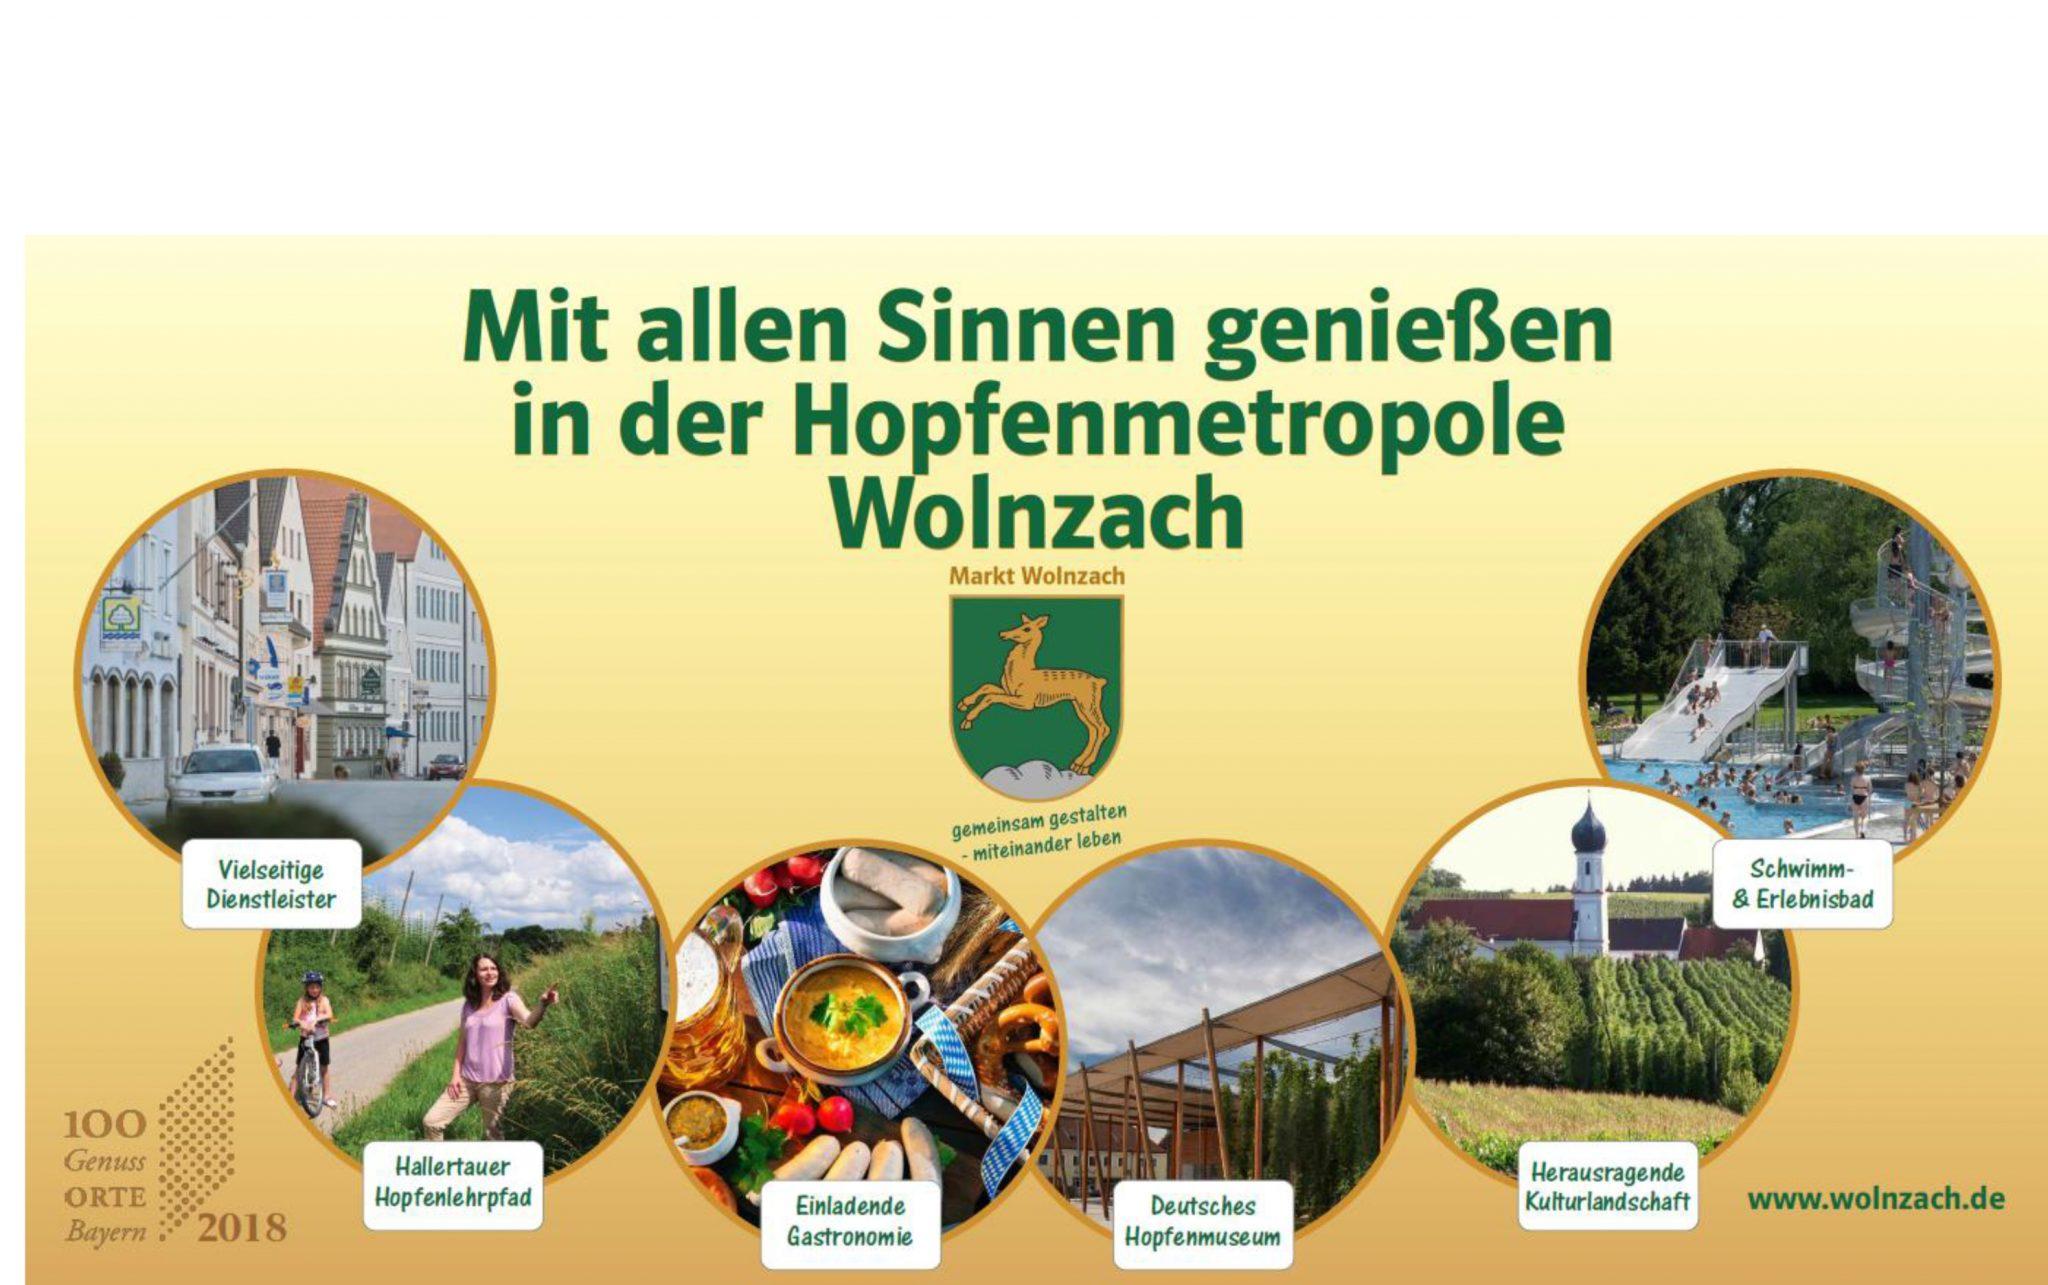 Genießen in der Hopfenmetropole